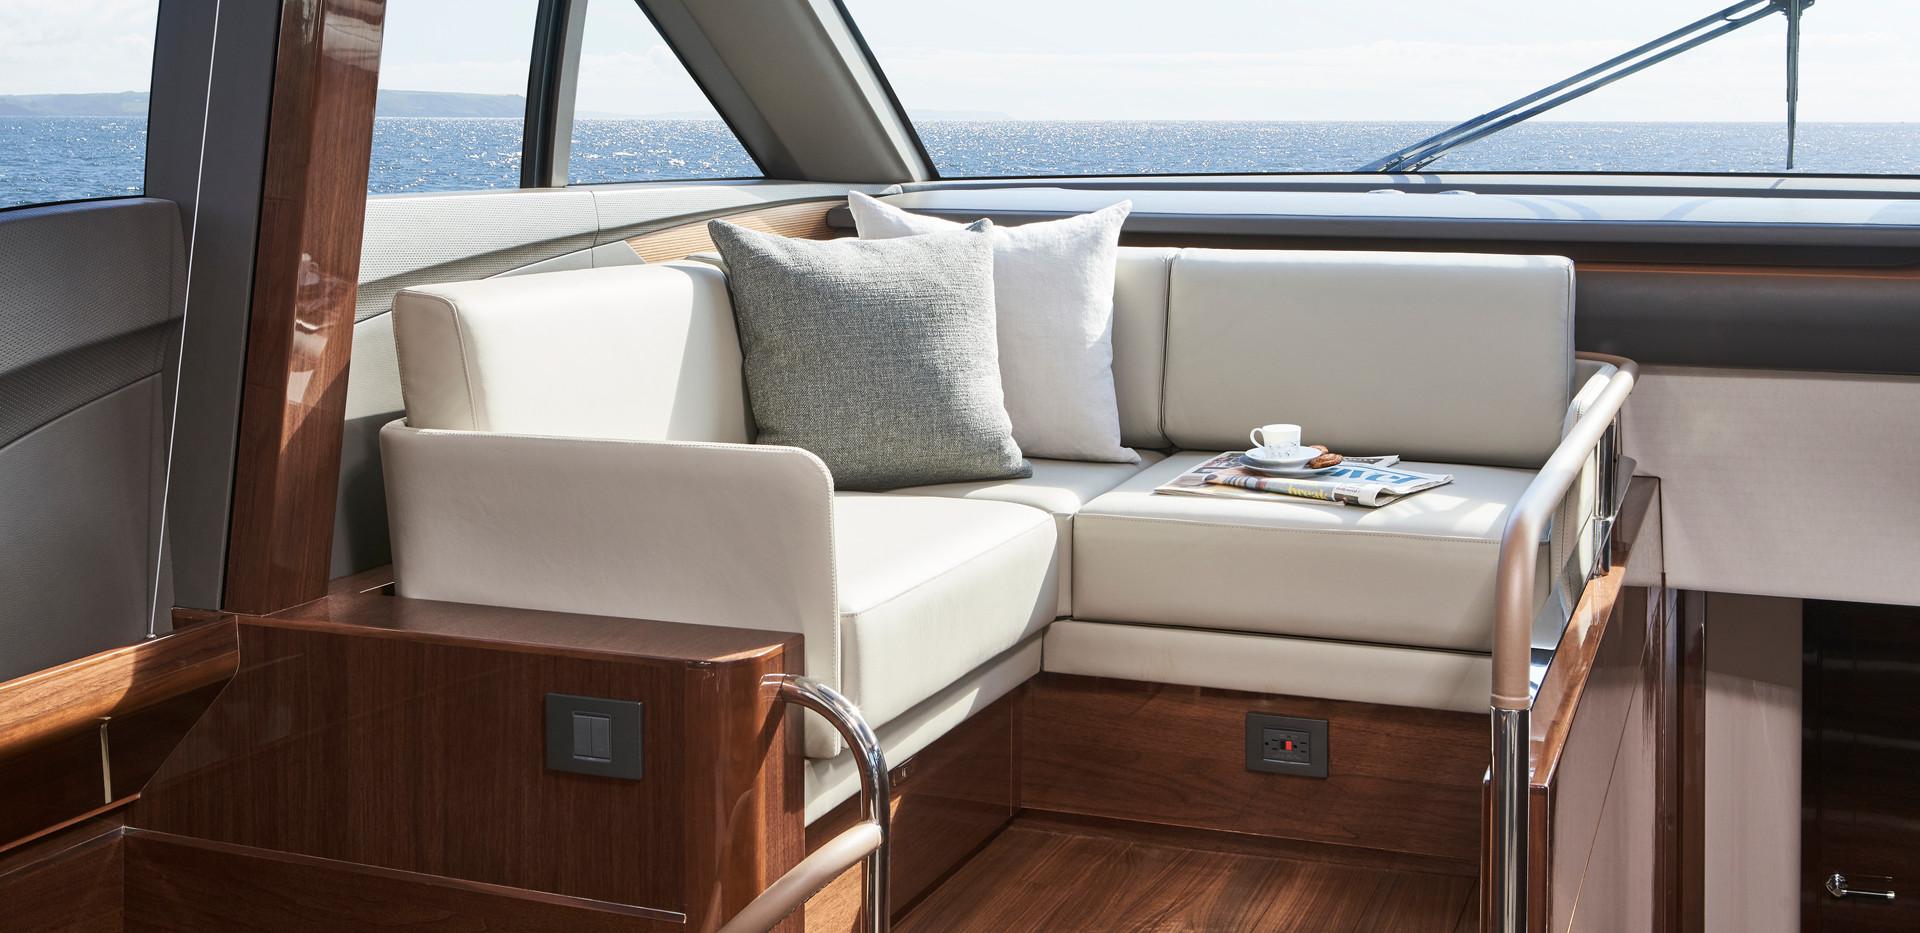 v78-interior-helmside-seating-walnut-glo